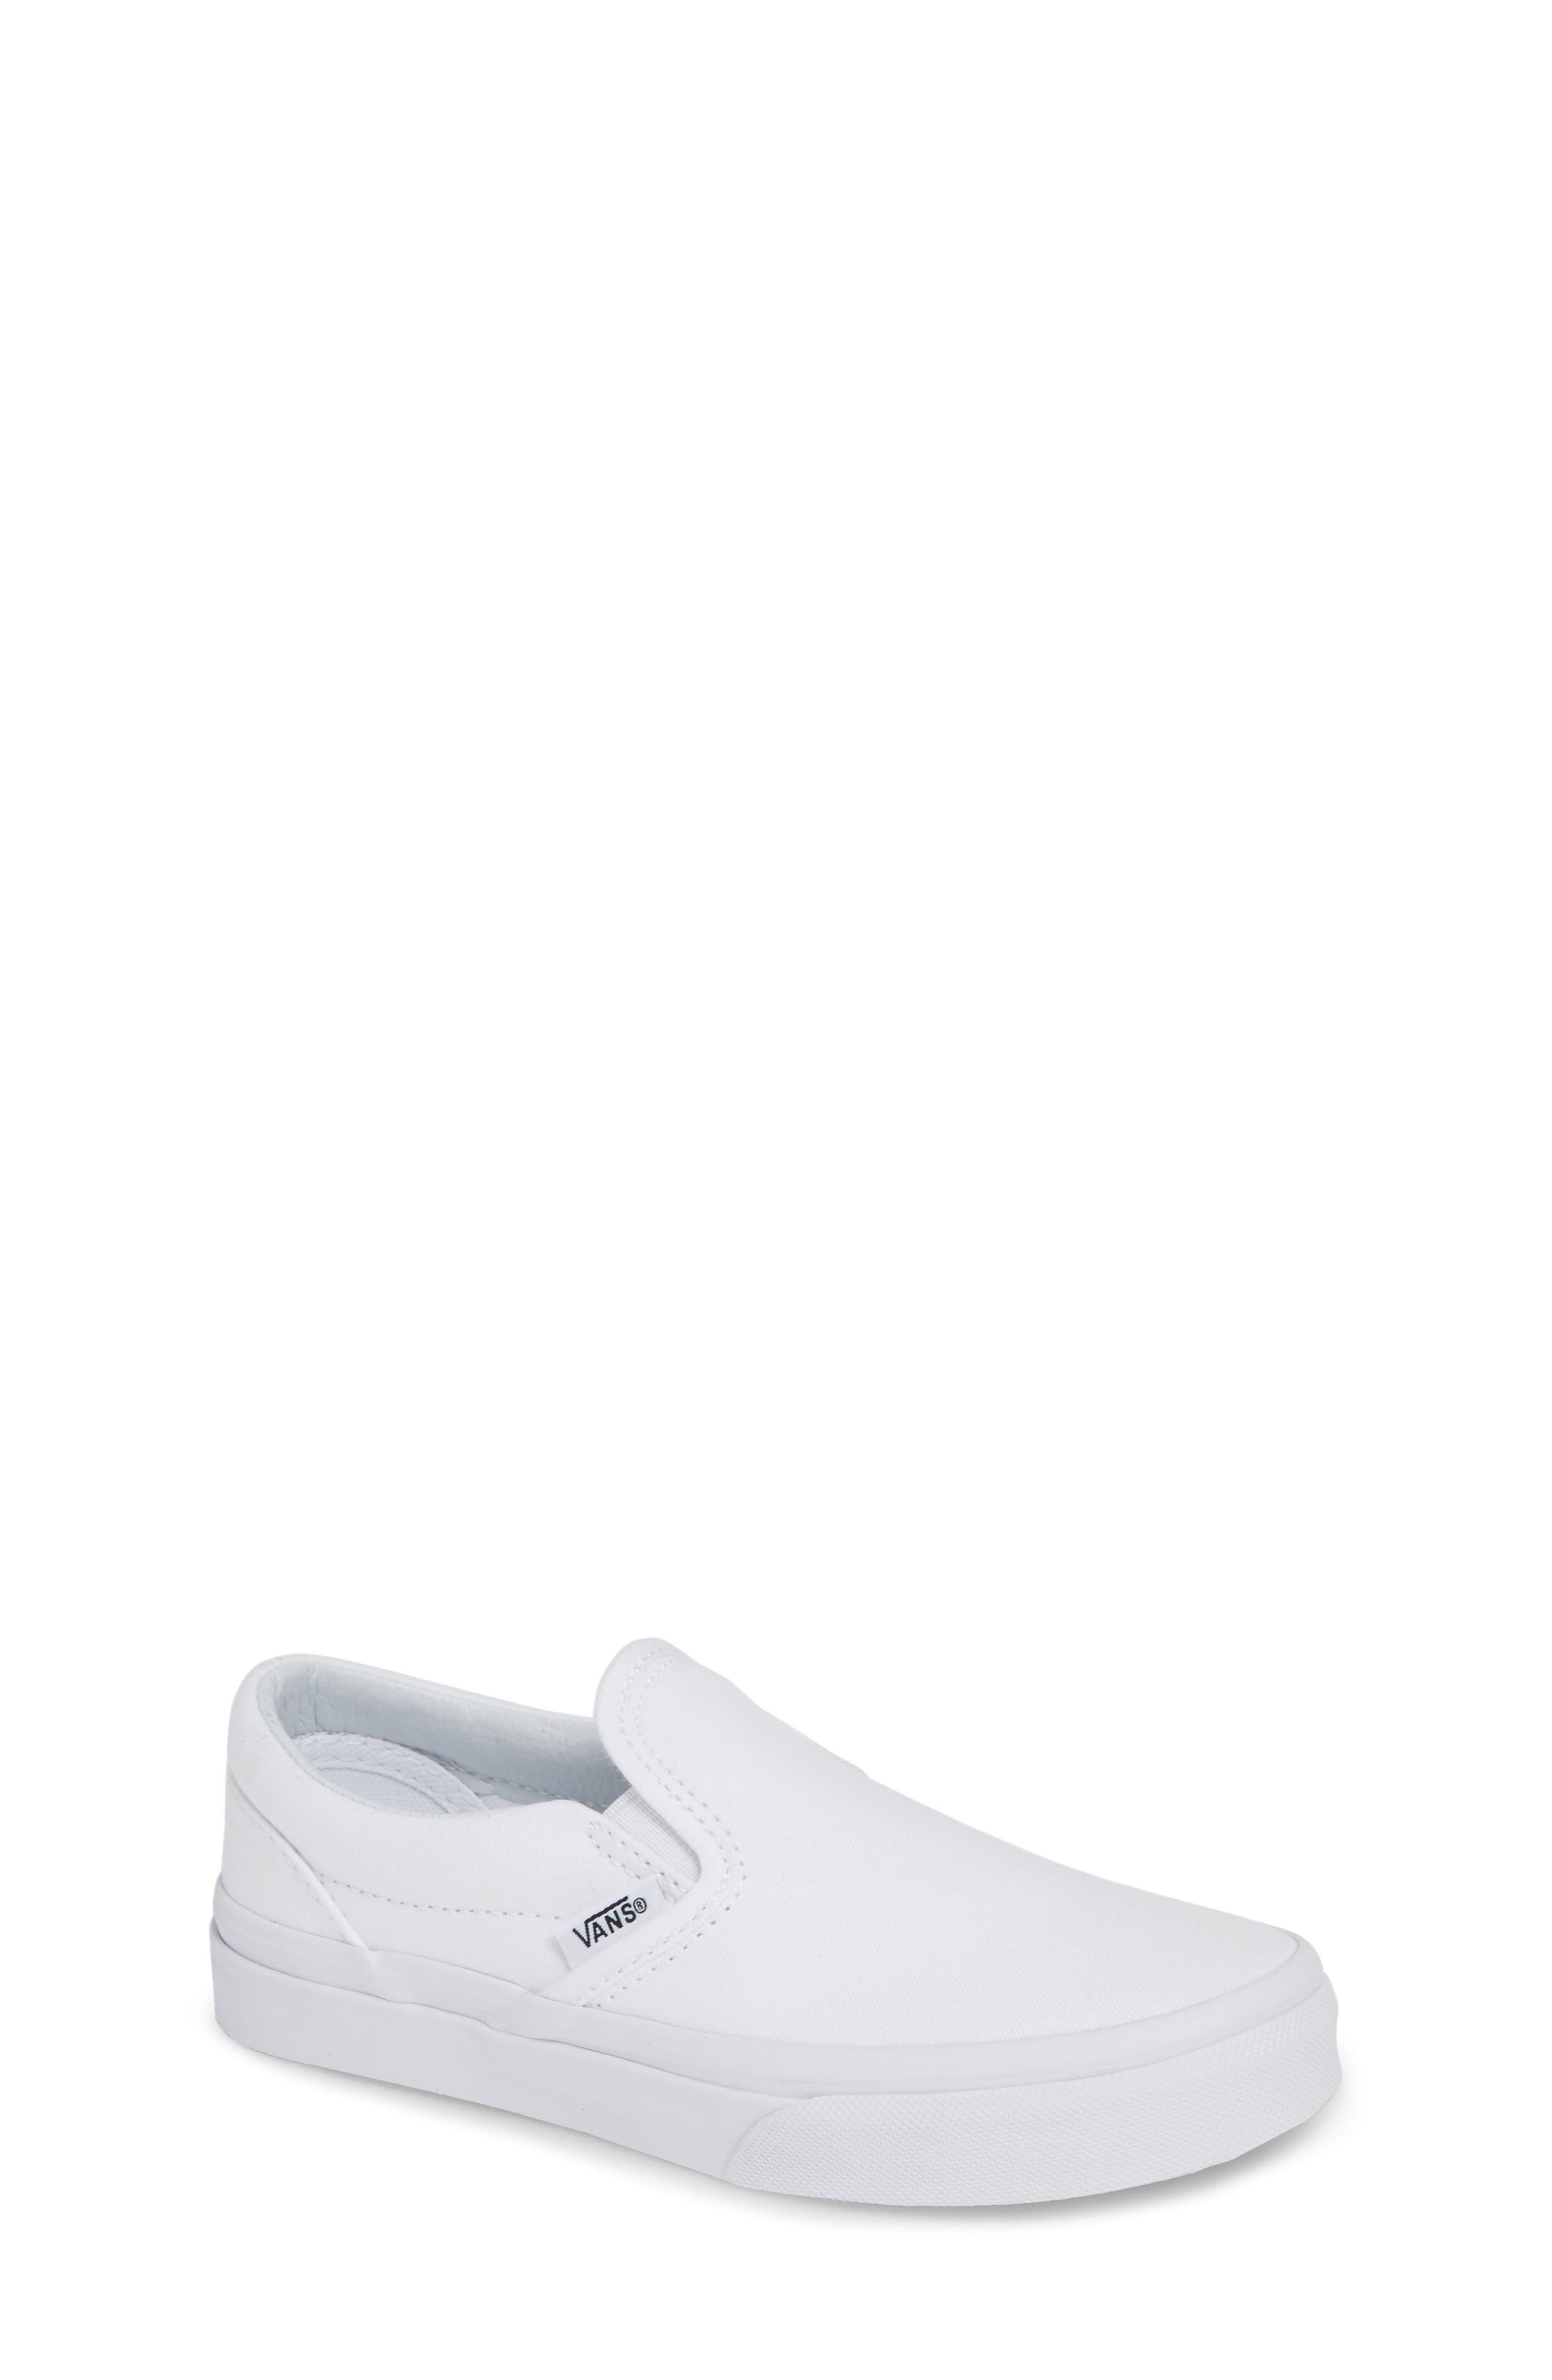 VANS 'Classic' Slip-On, Main, color, TRUE WHITE